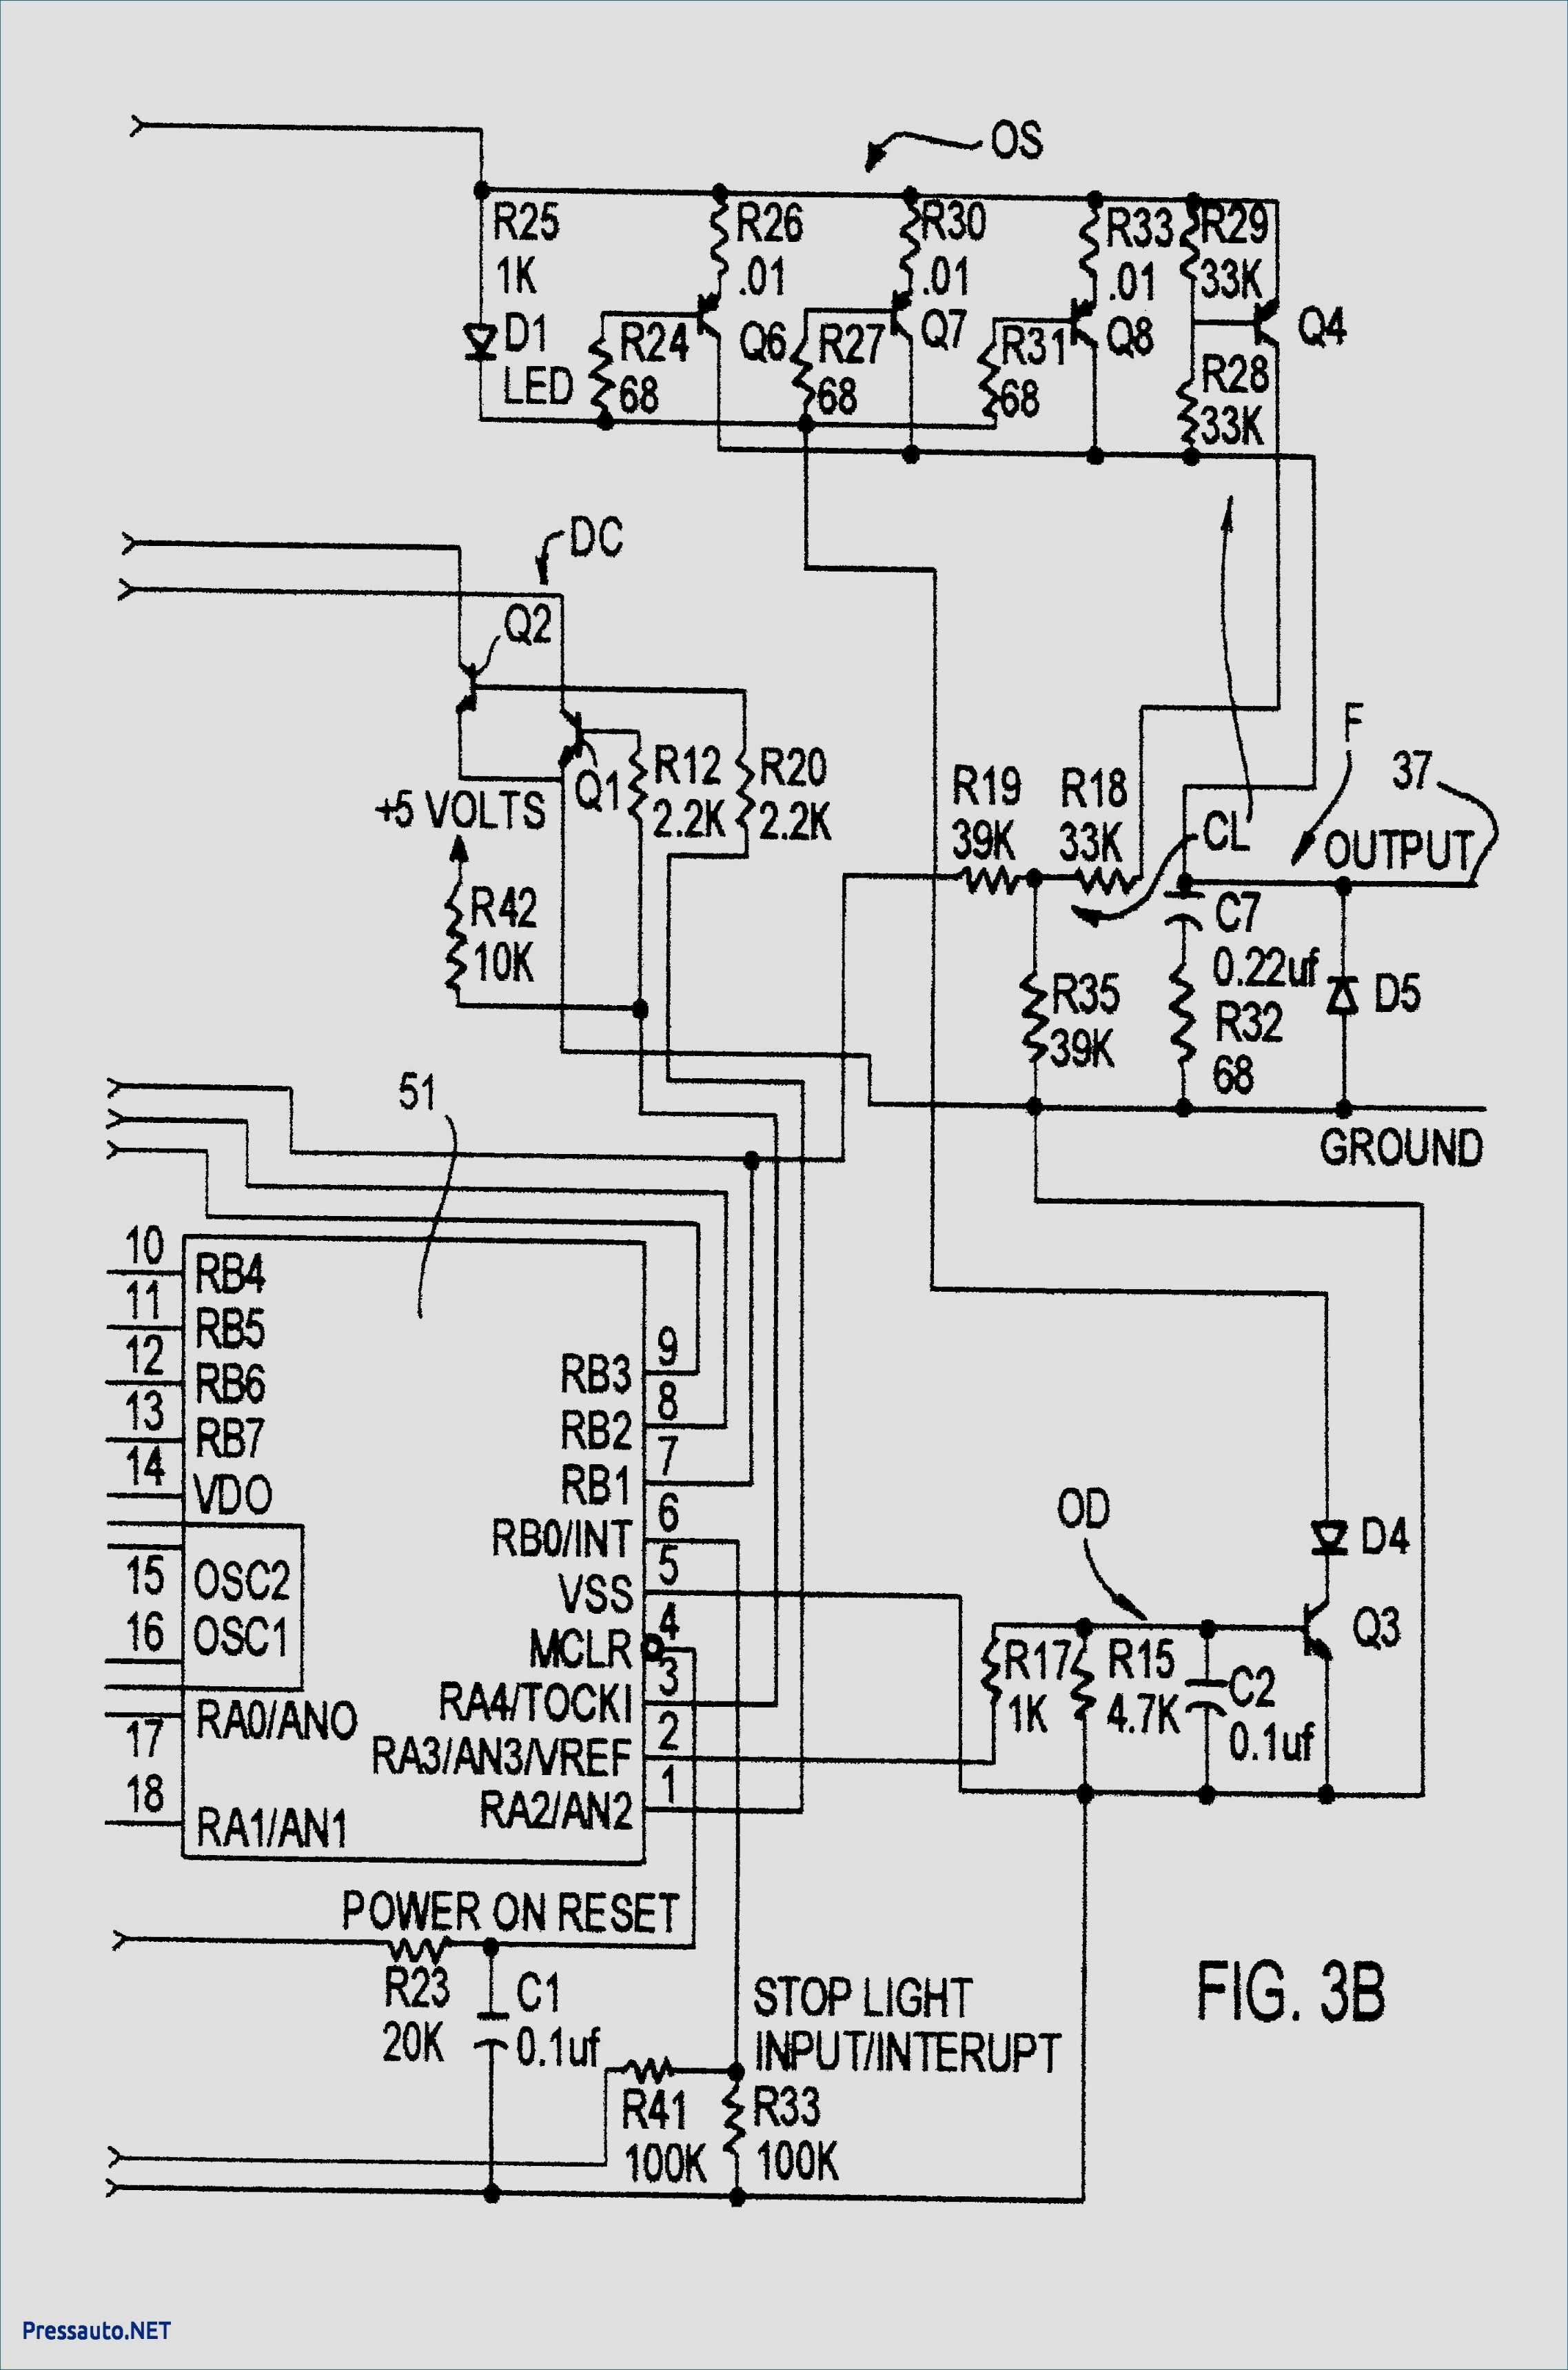 vauxhall sintra wiring diagram tekonsha voyager electric ke wiring diagram wiring diagram data  tekonsha voyager electric ke wiring